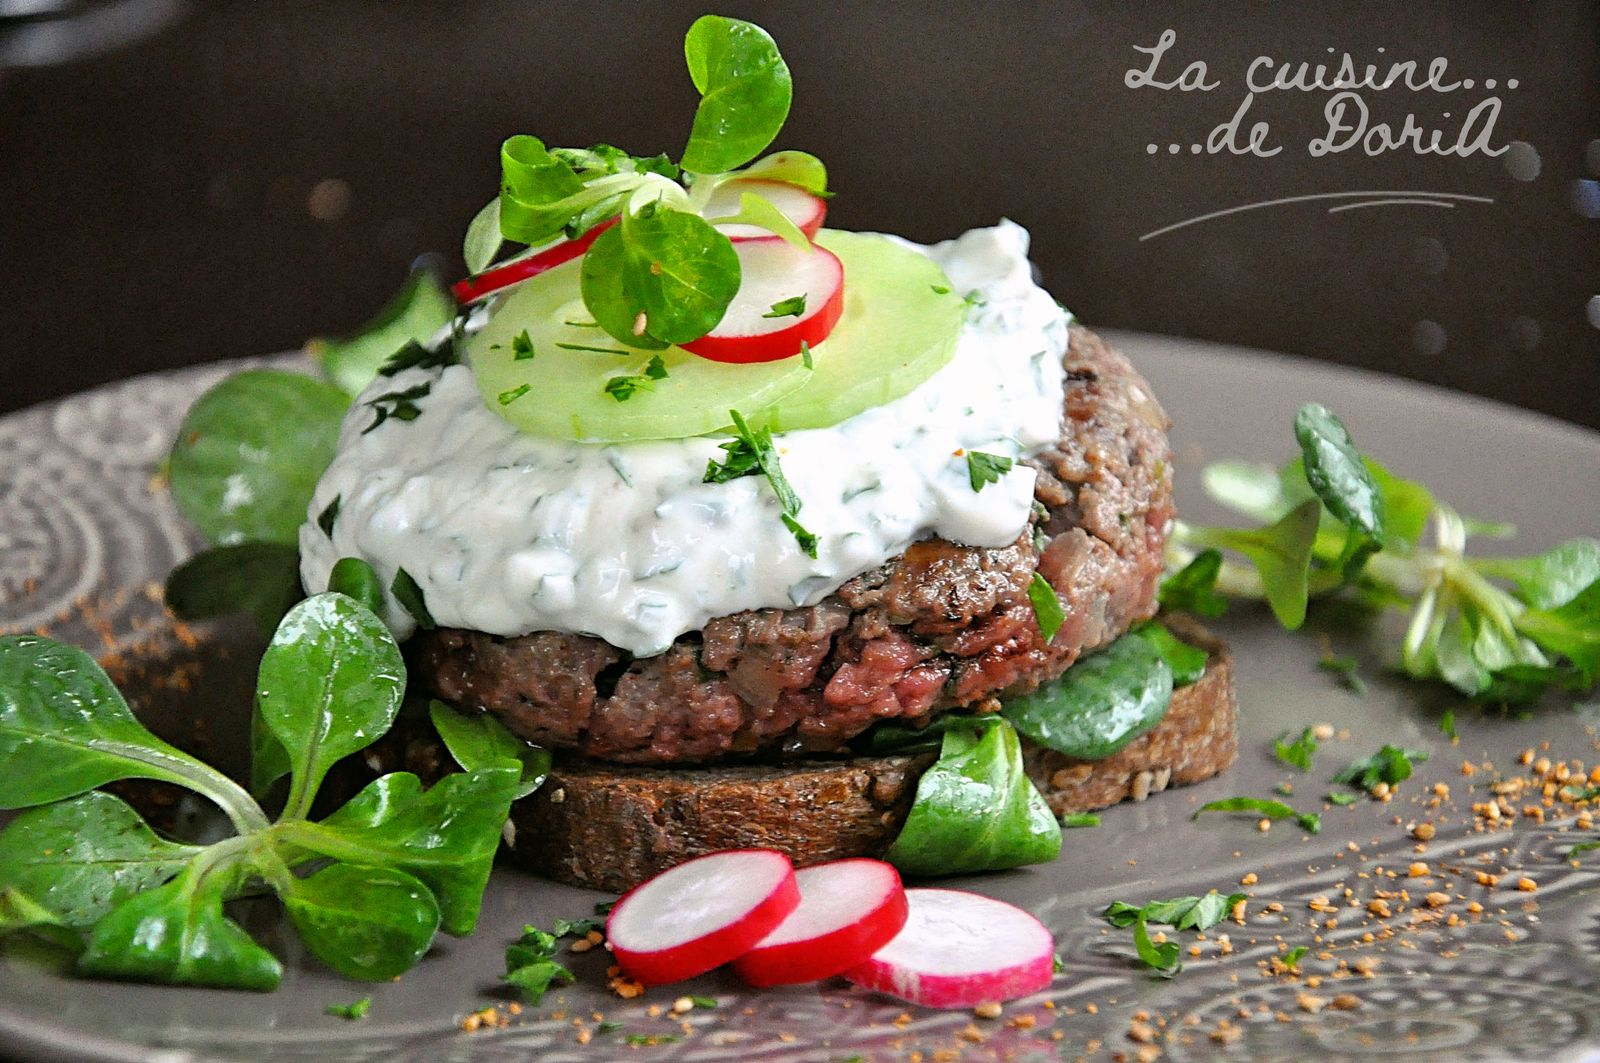 Burgers de boeuf, sauce fromage blanc et persil